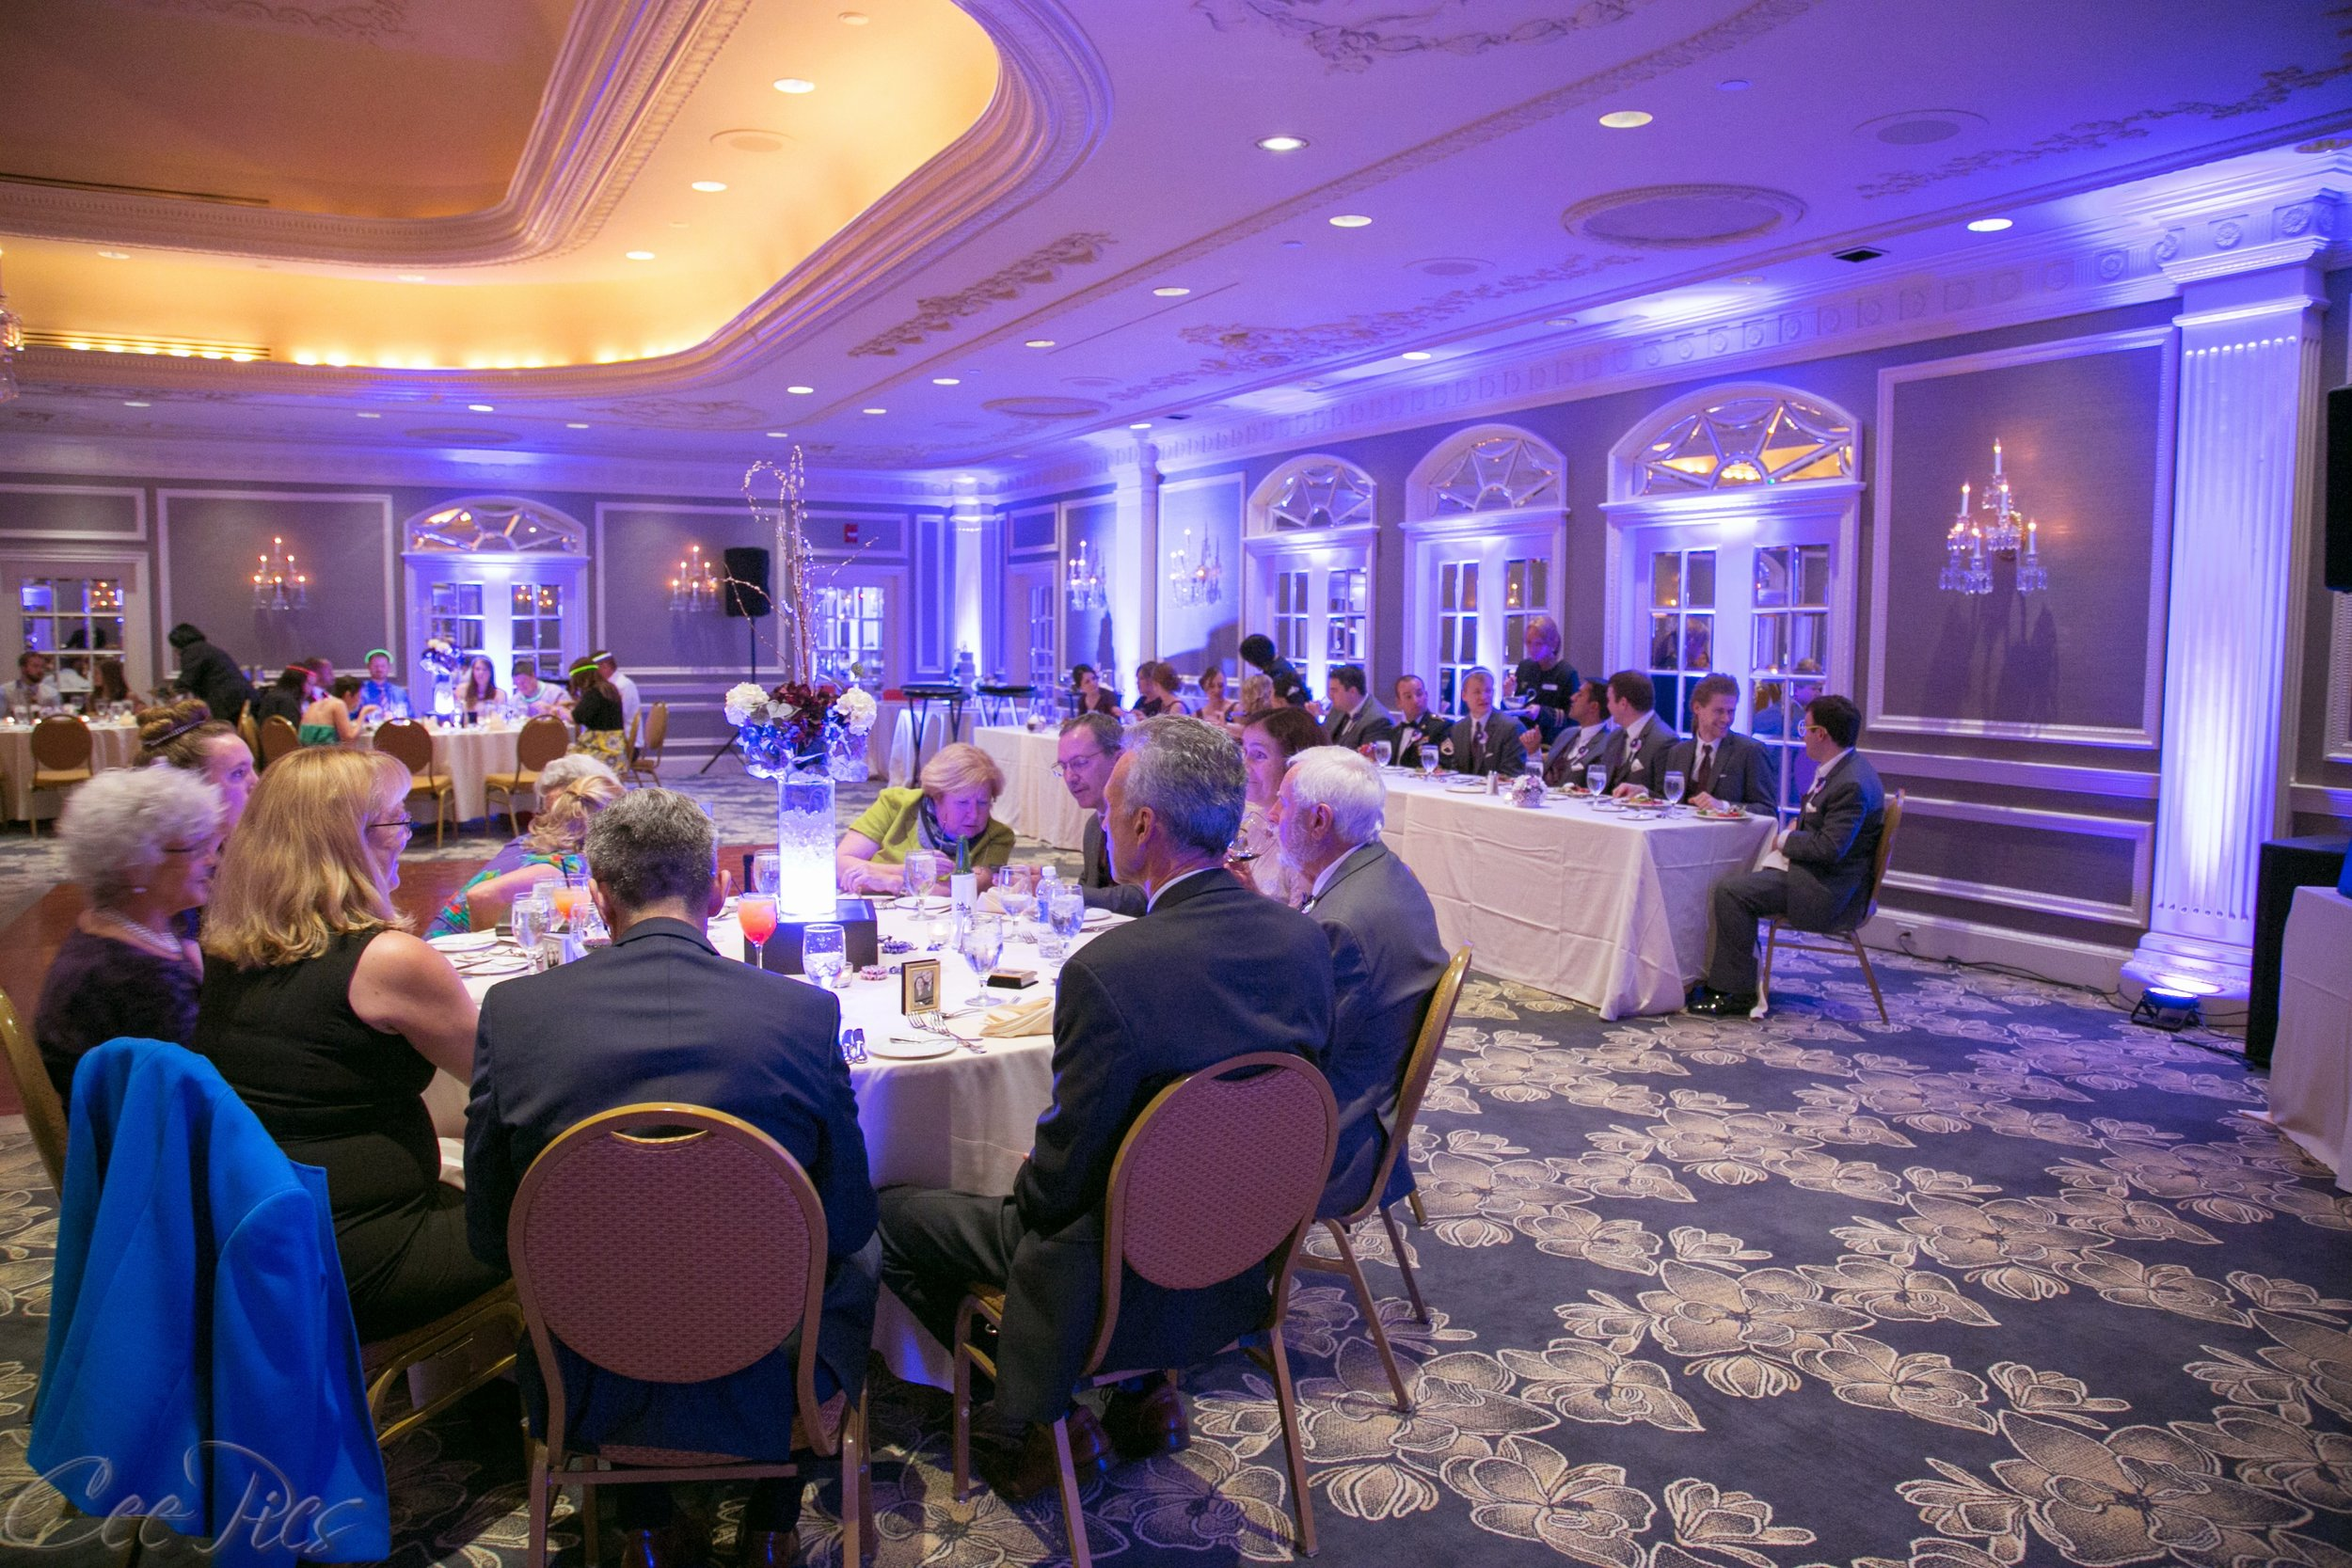 Opryland Hotel - Magnolia Ballroom